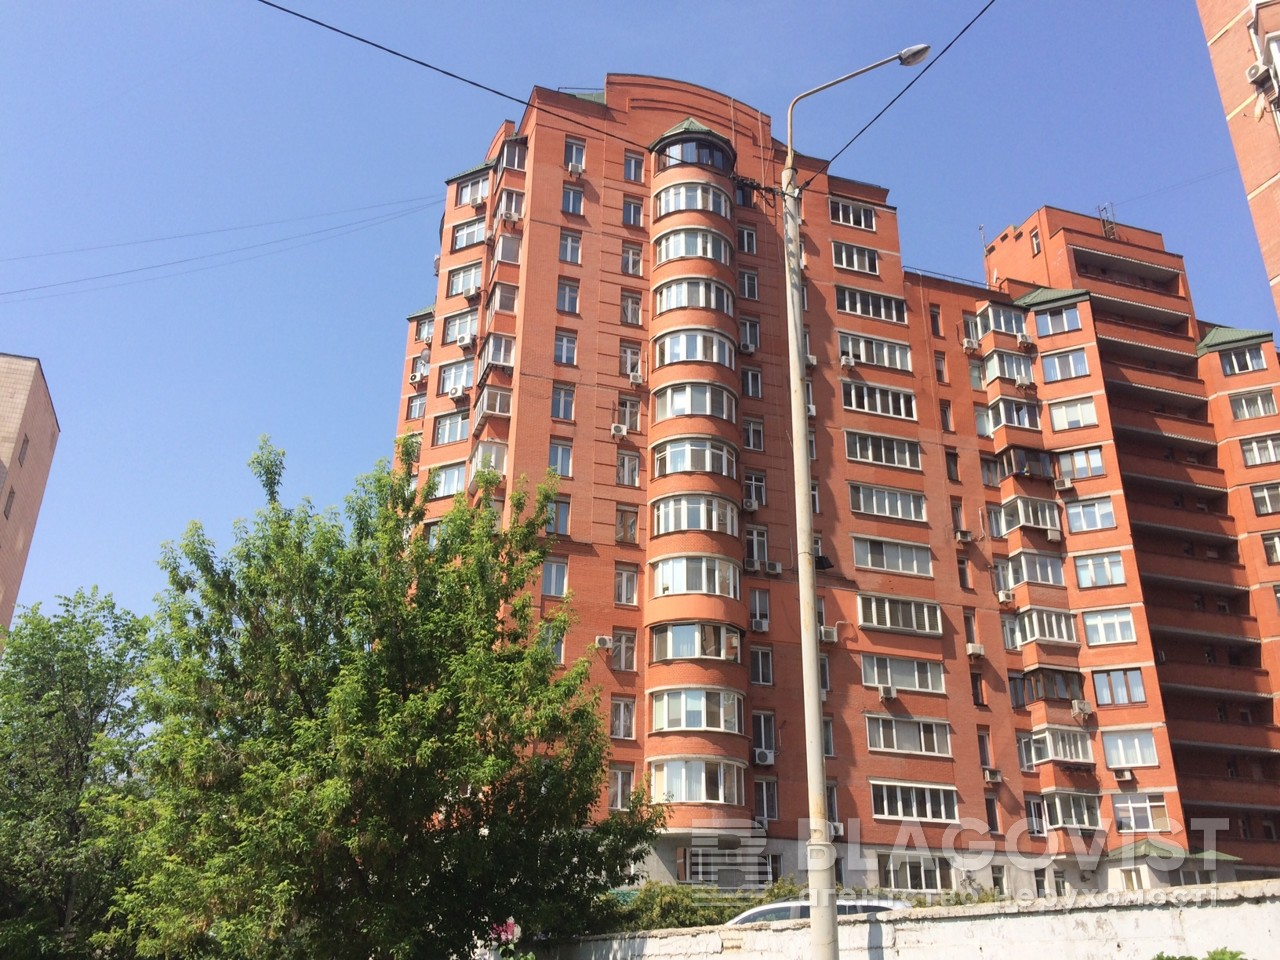 Квартира M-3707, Златоустовская, 10/12, Киев - Фото 2